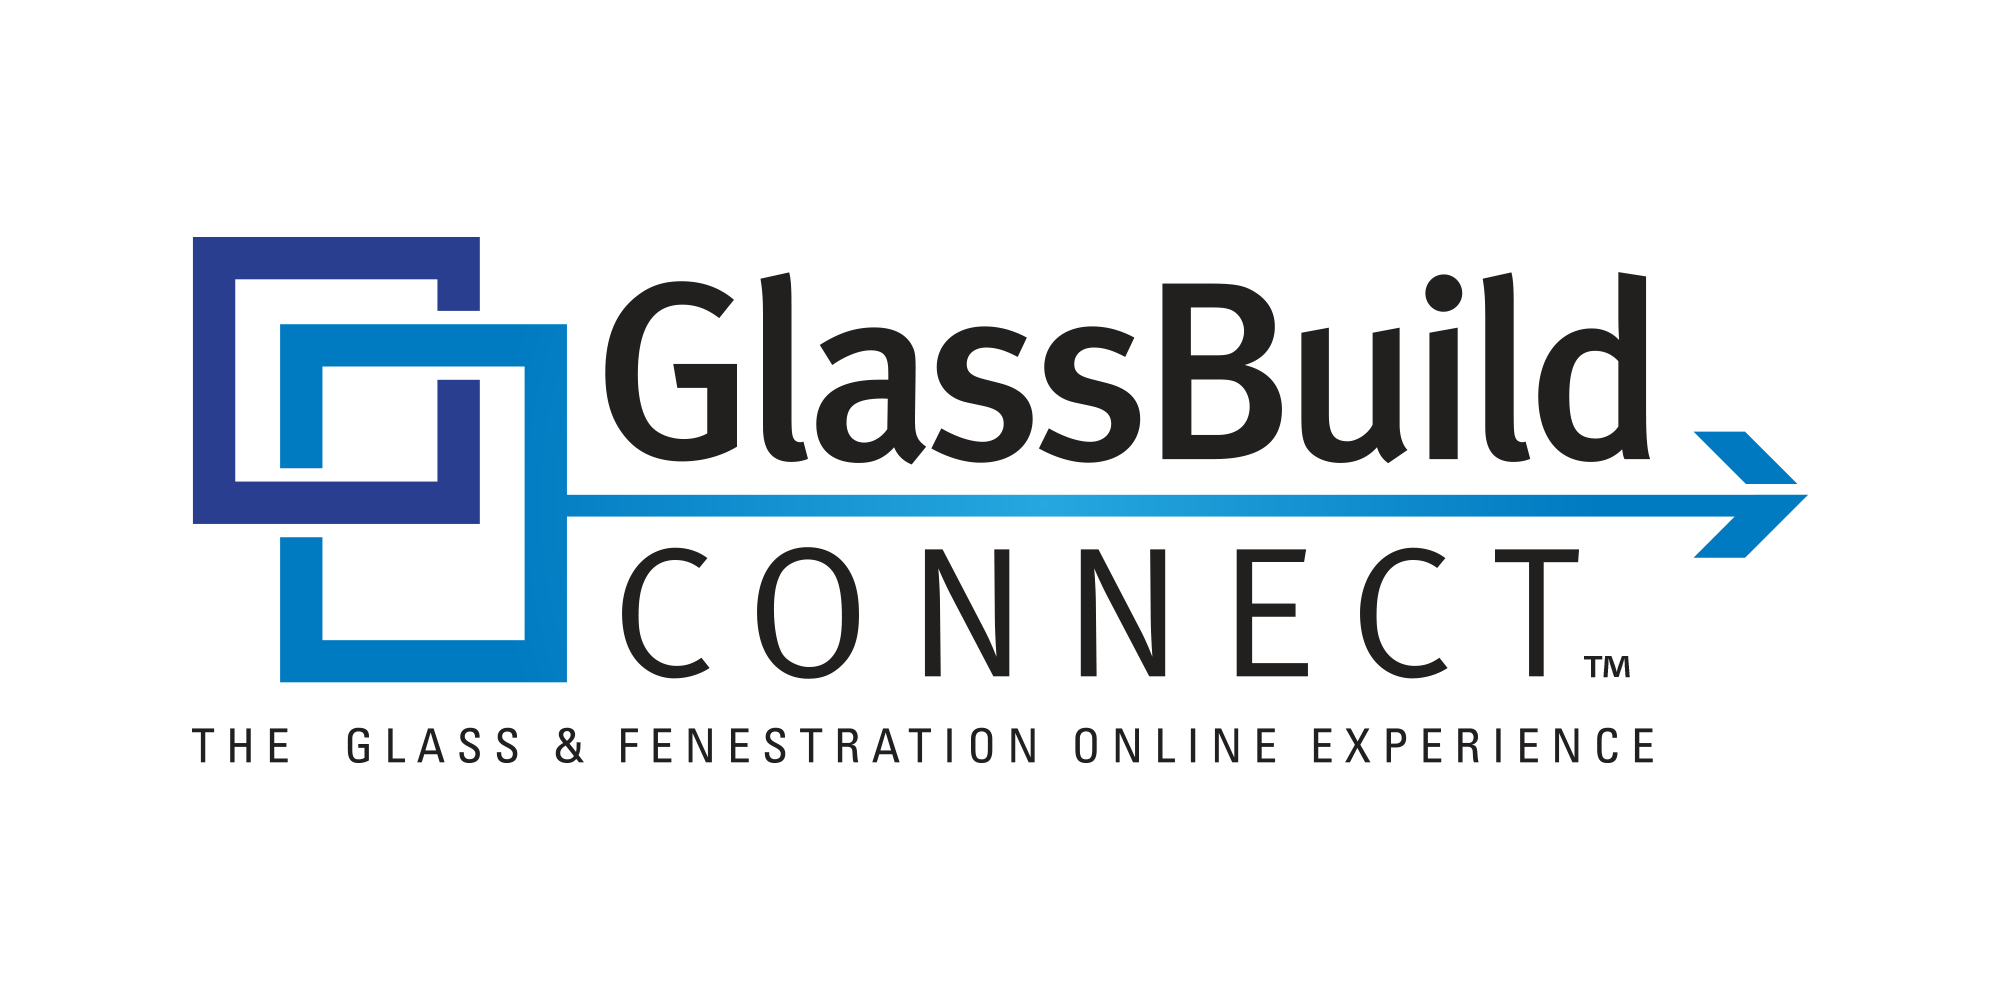 NGA Extends GlassBuild Connect Through 2020